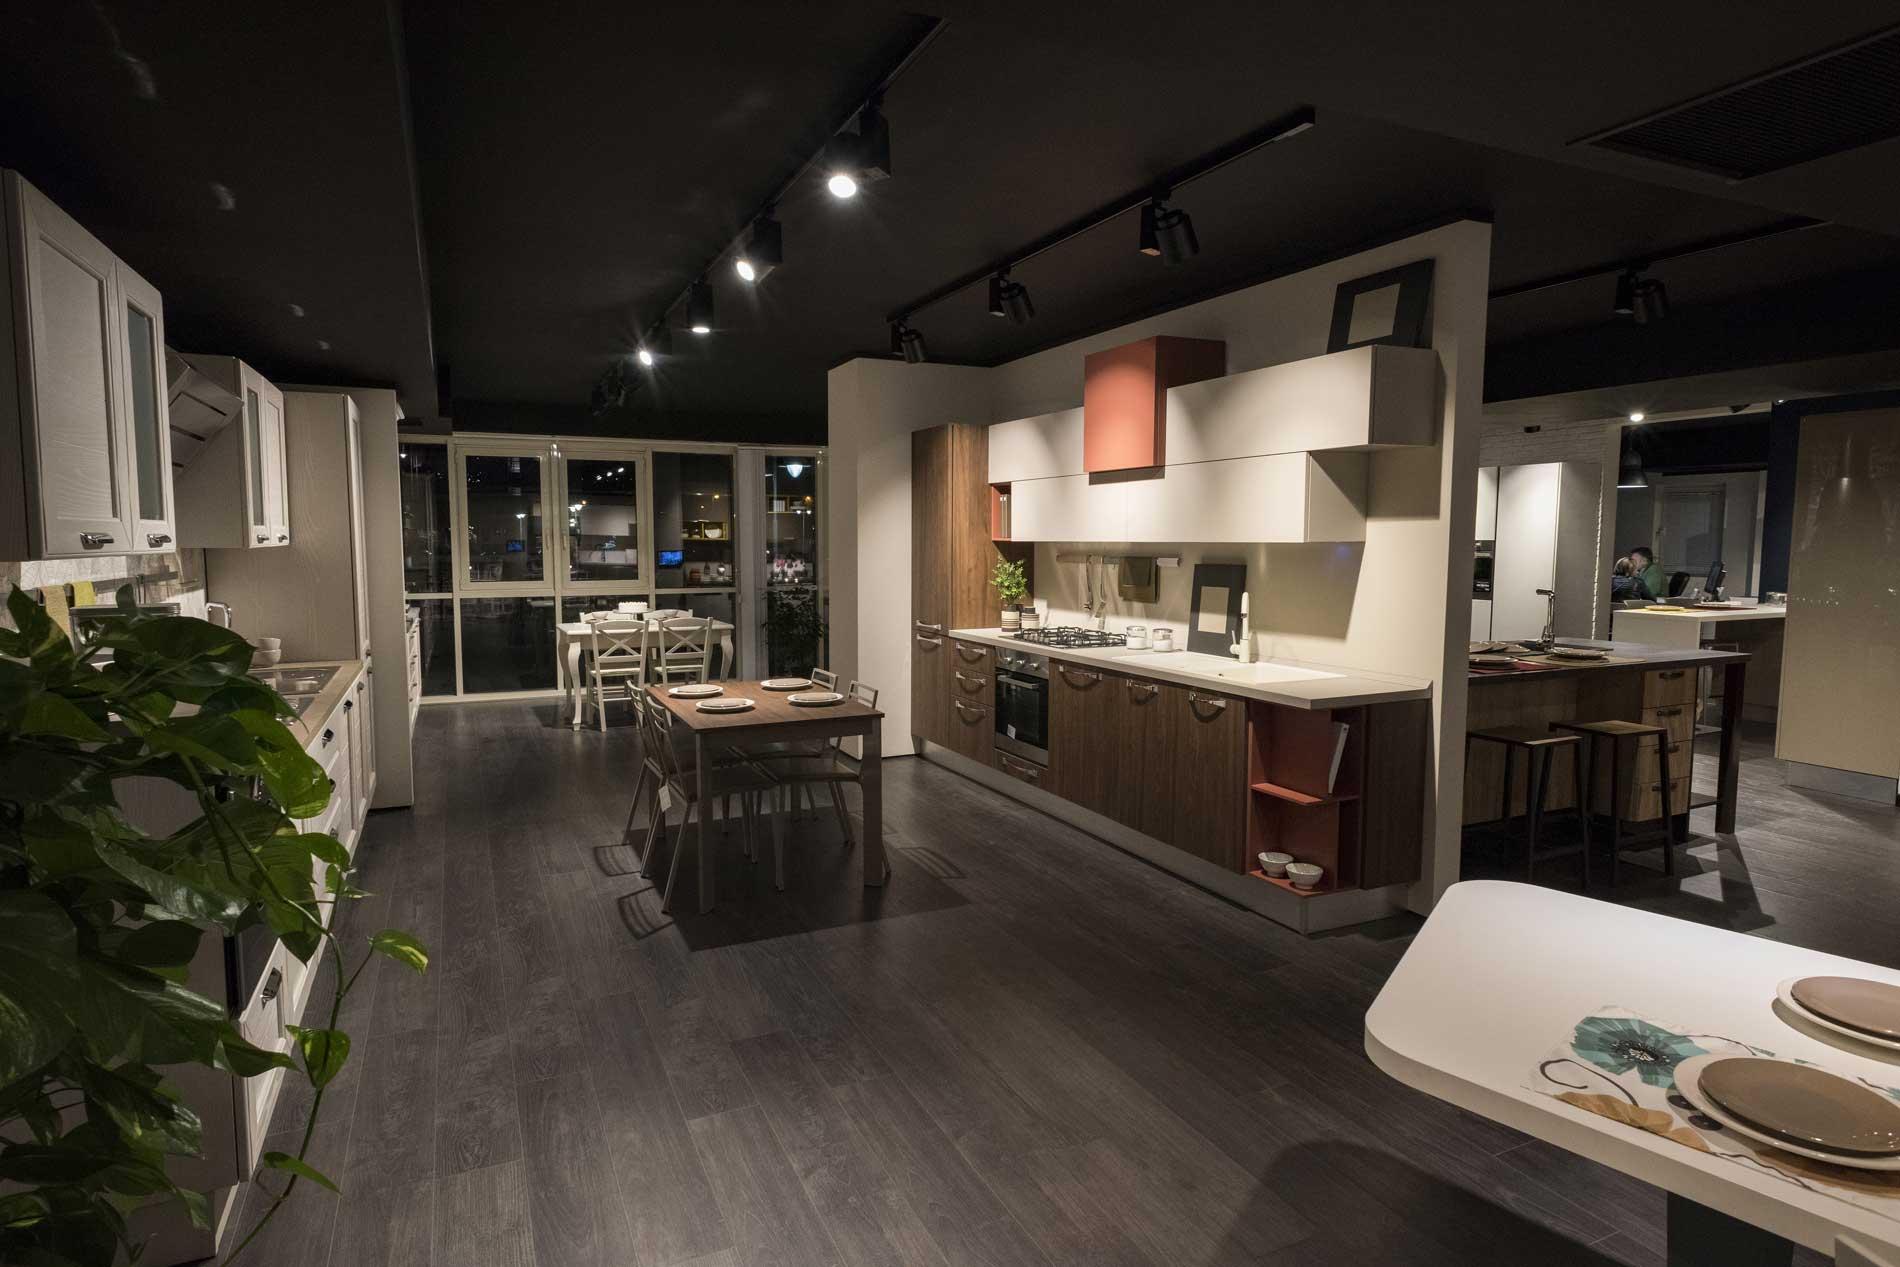 Showroom Elce Lube Store Cucine Genova Campi Elce